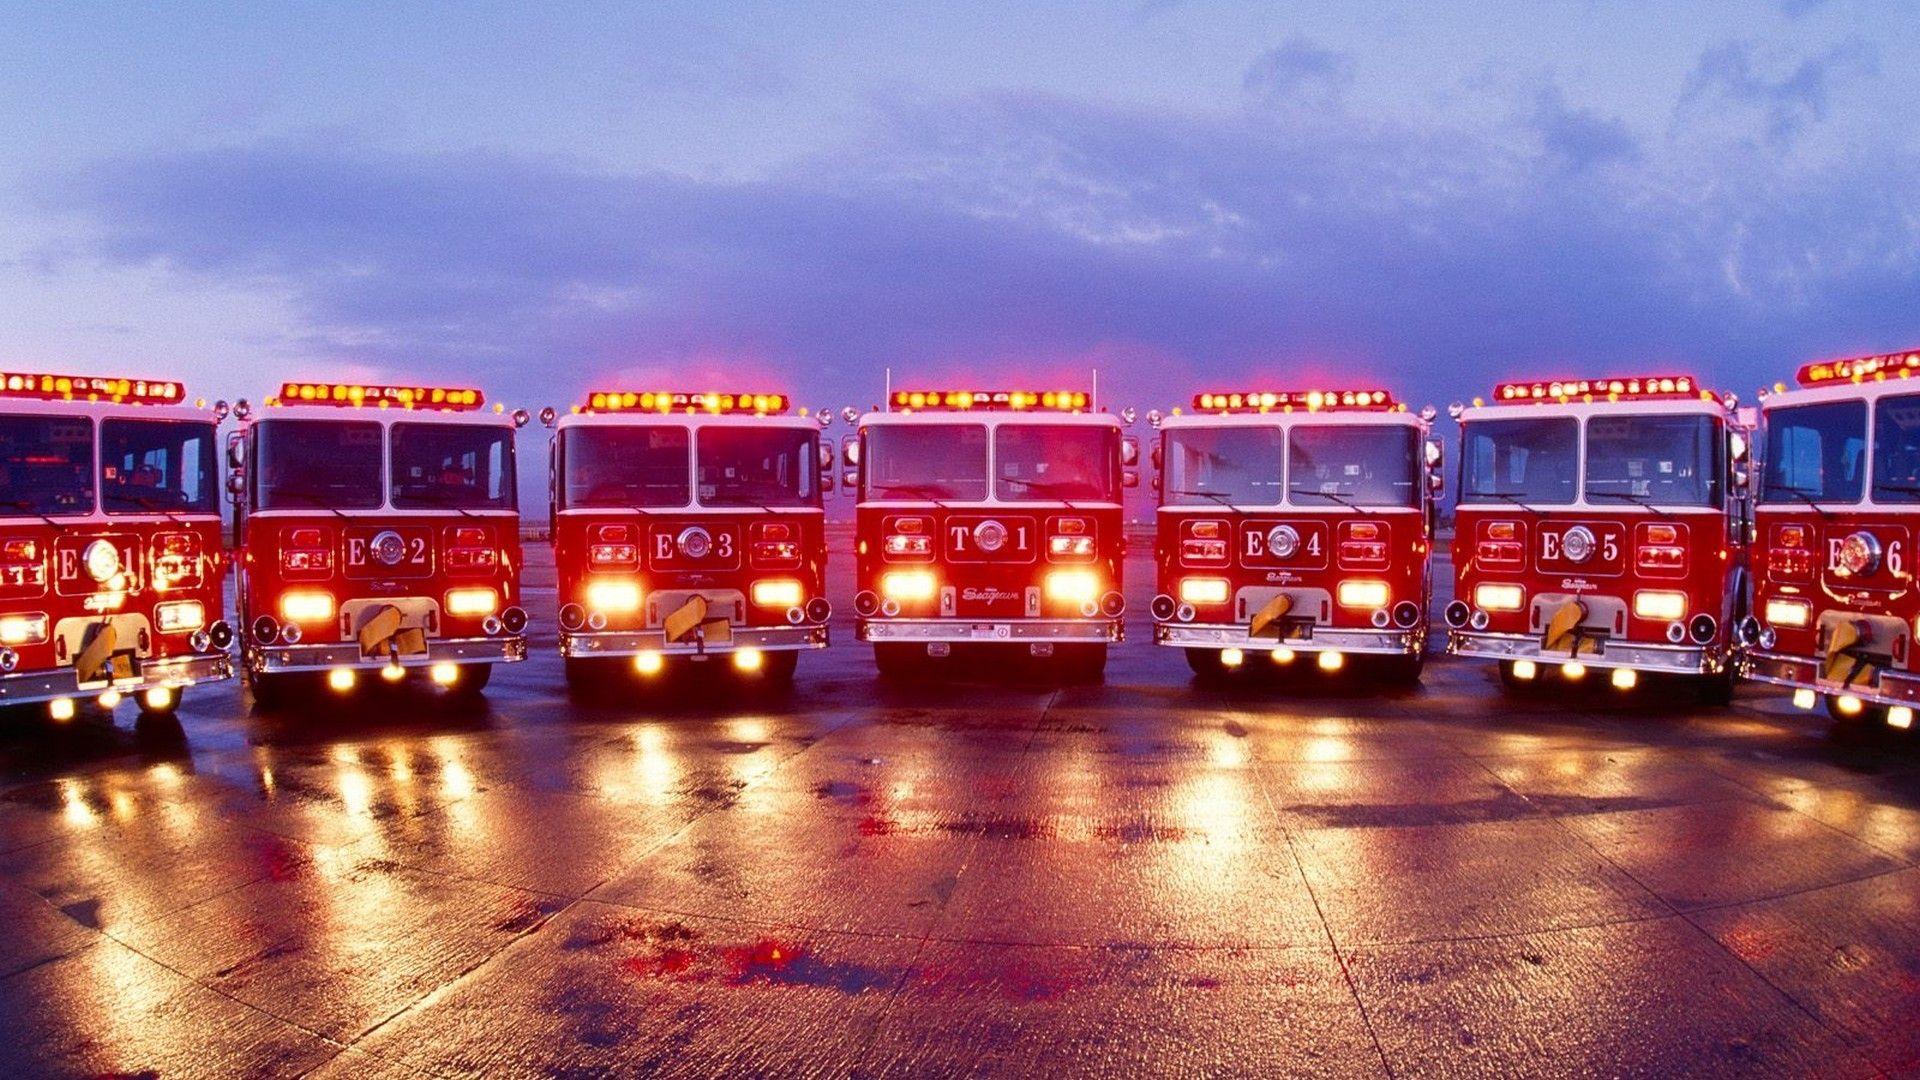 Best Of Fire Department Desktop Wallpaper Firefighter Wallpaper Firefighter Fire Trucks